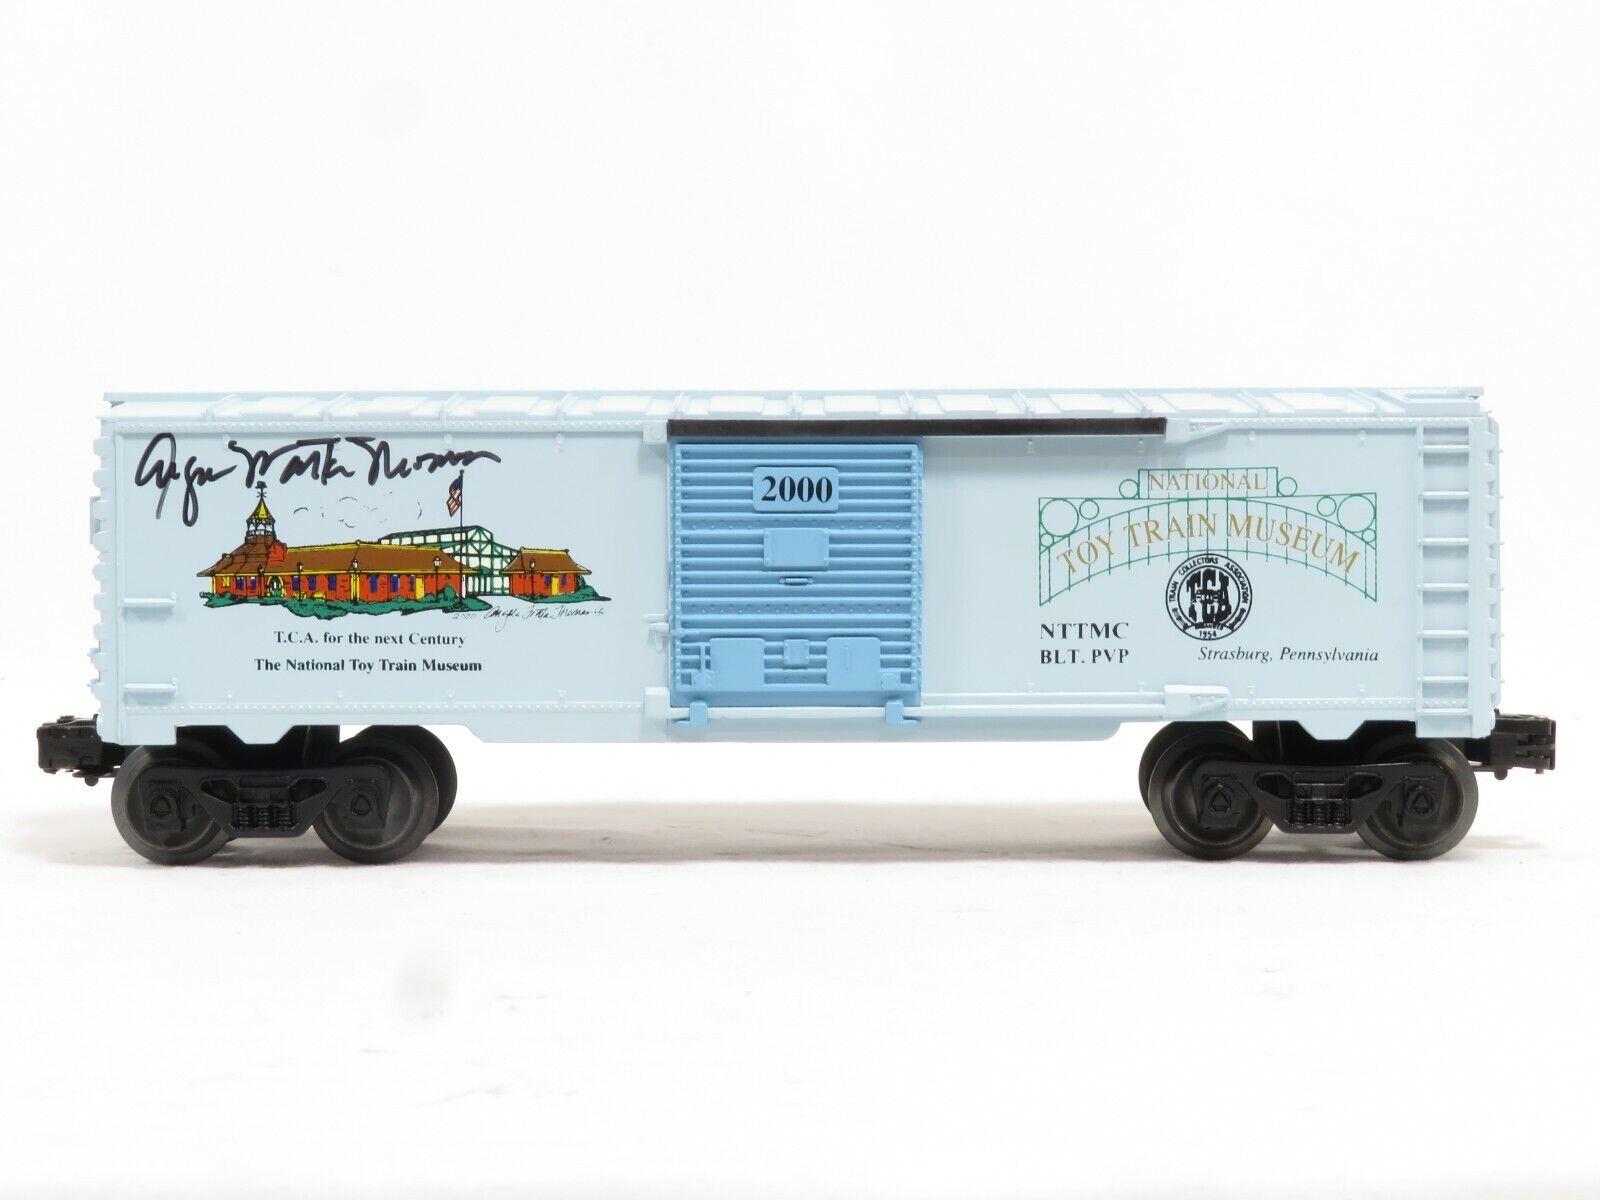 LIONEL 2000 National Toy Train Museum 2000 Signed Angela Tredta Thomas NIB